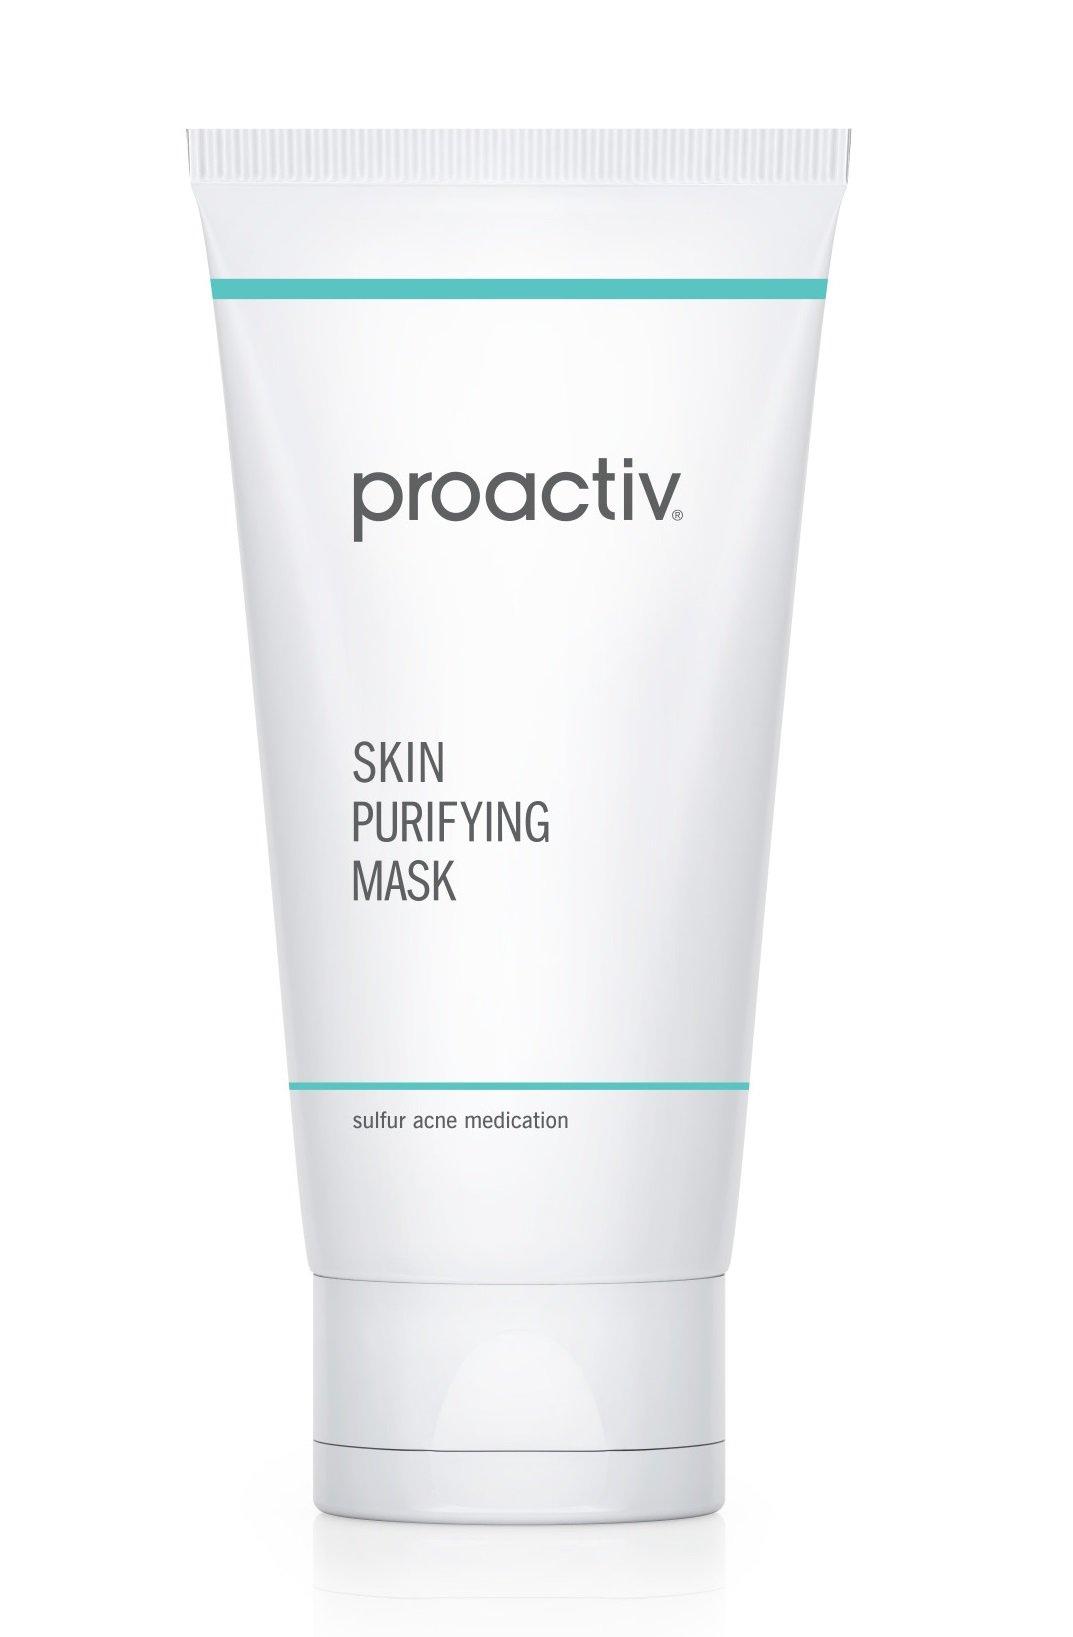 Proactiv Skin Purifying Mask, 3 Ounce (90 Day)